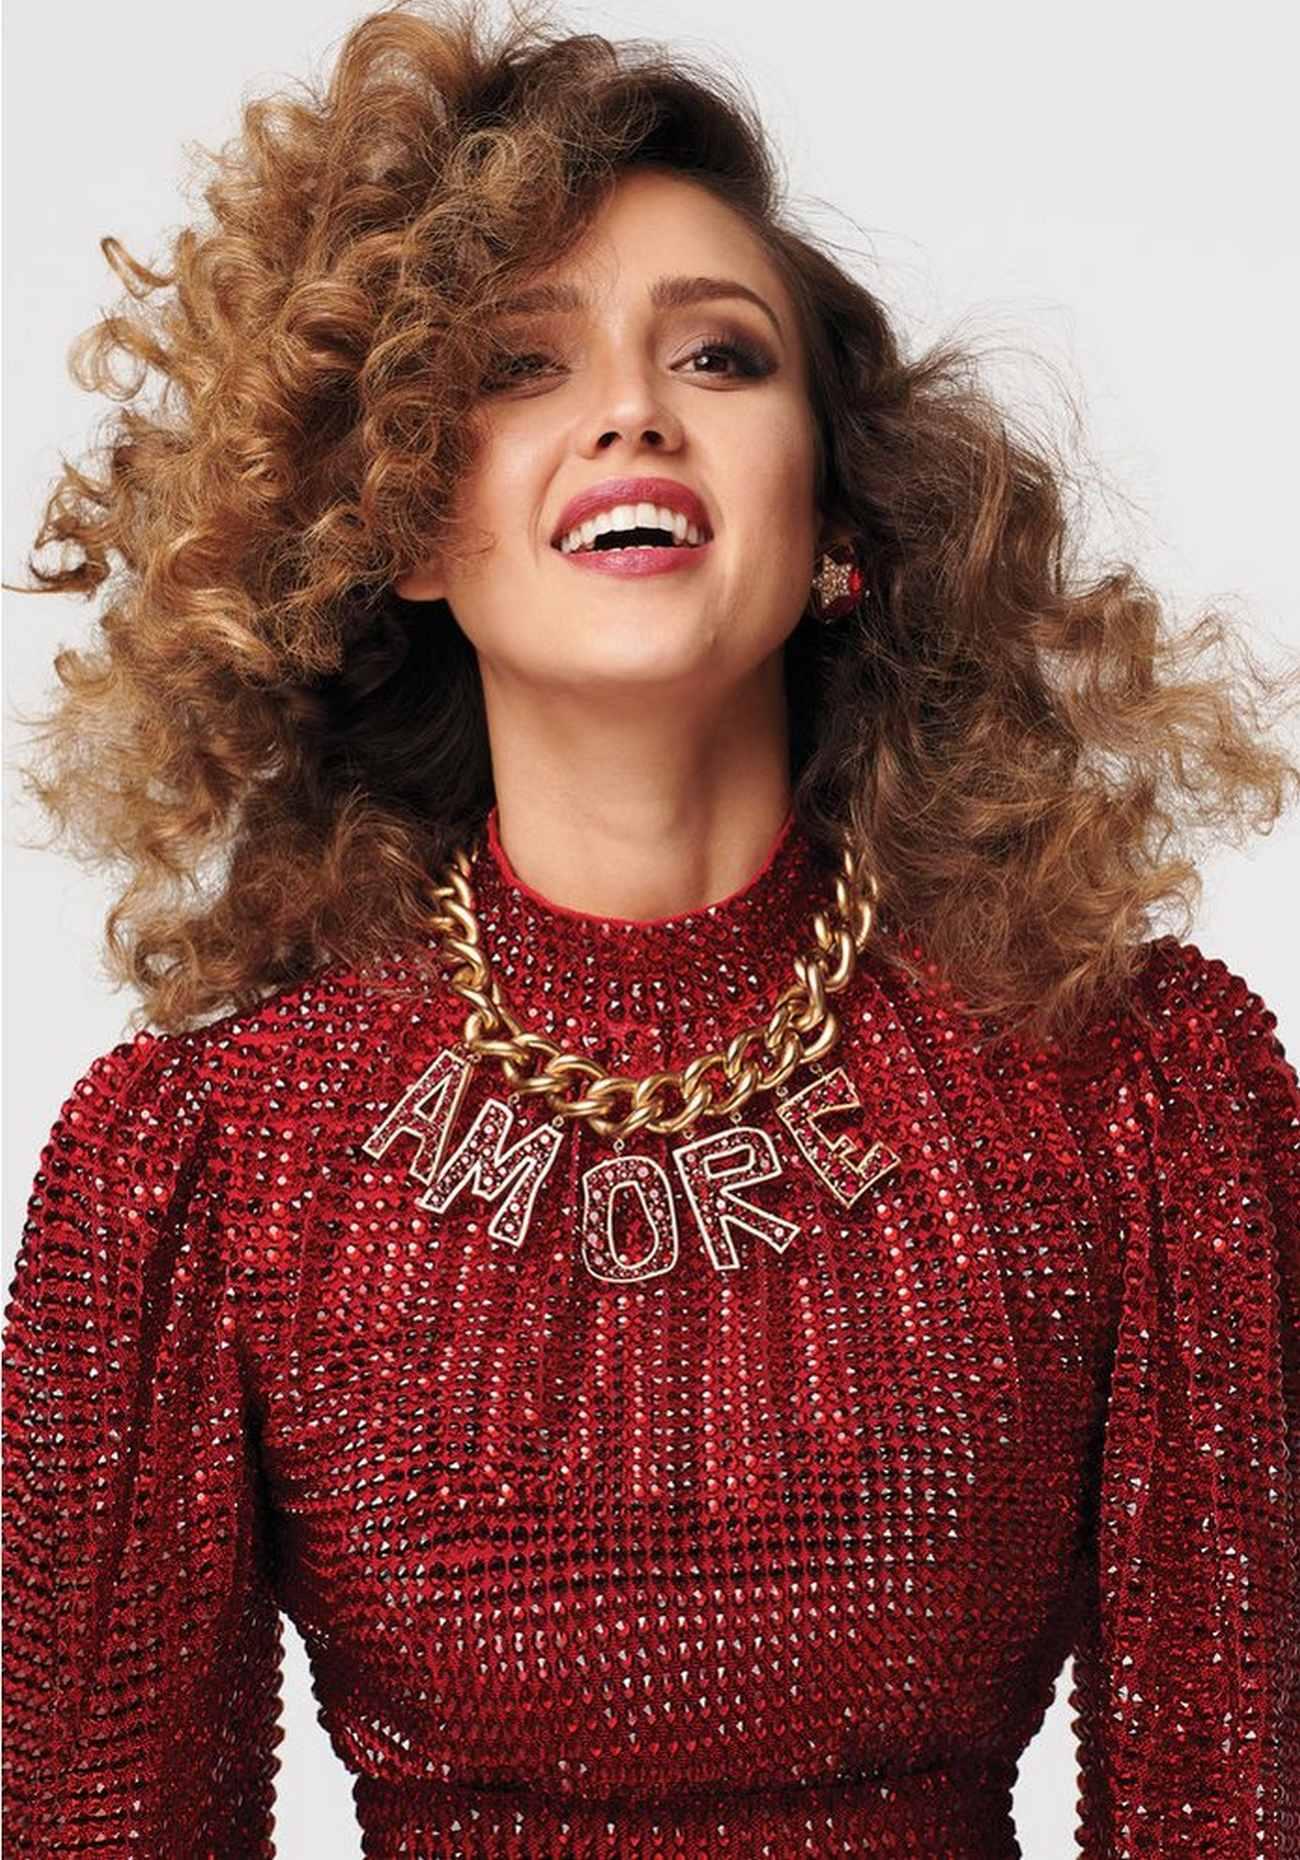 Jessica-Alba-InStyle-July-201800002.jpg